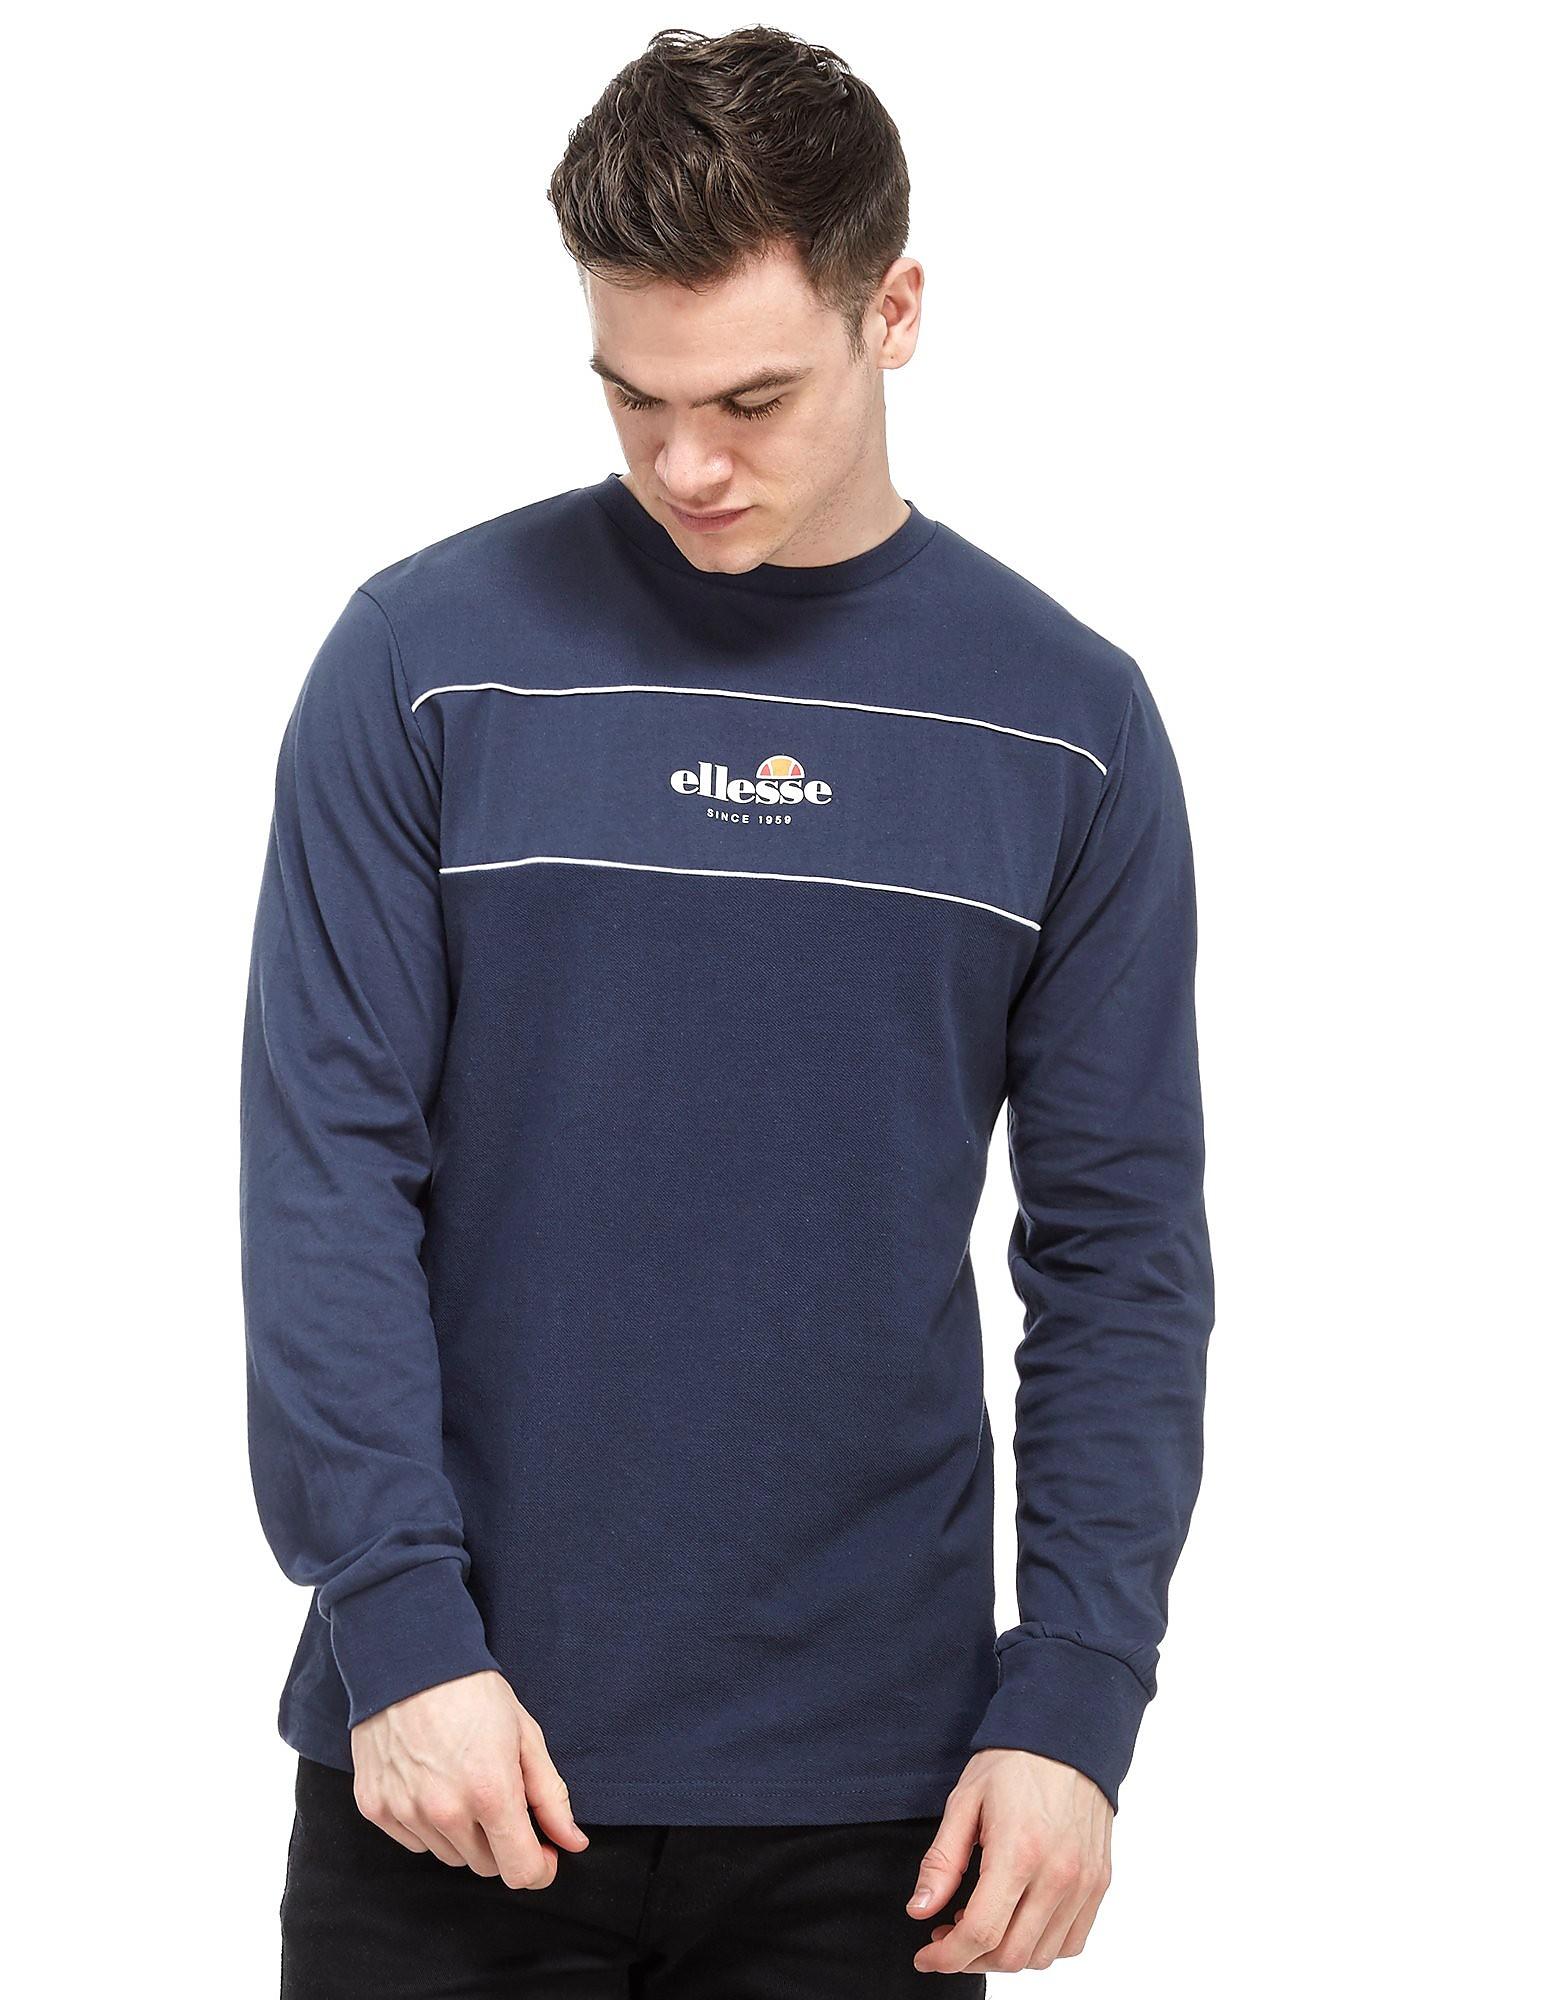 Ellesse Cannavaro Panel Long Sleeve T-Shirt